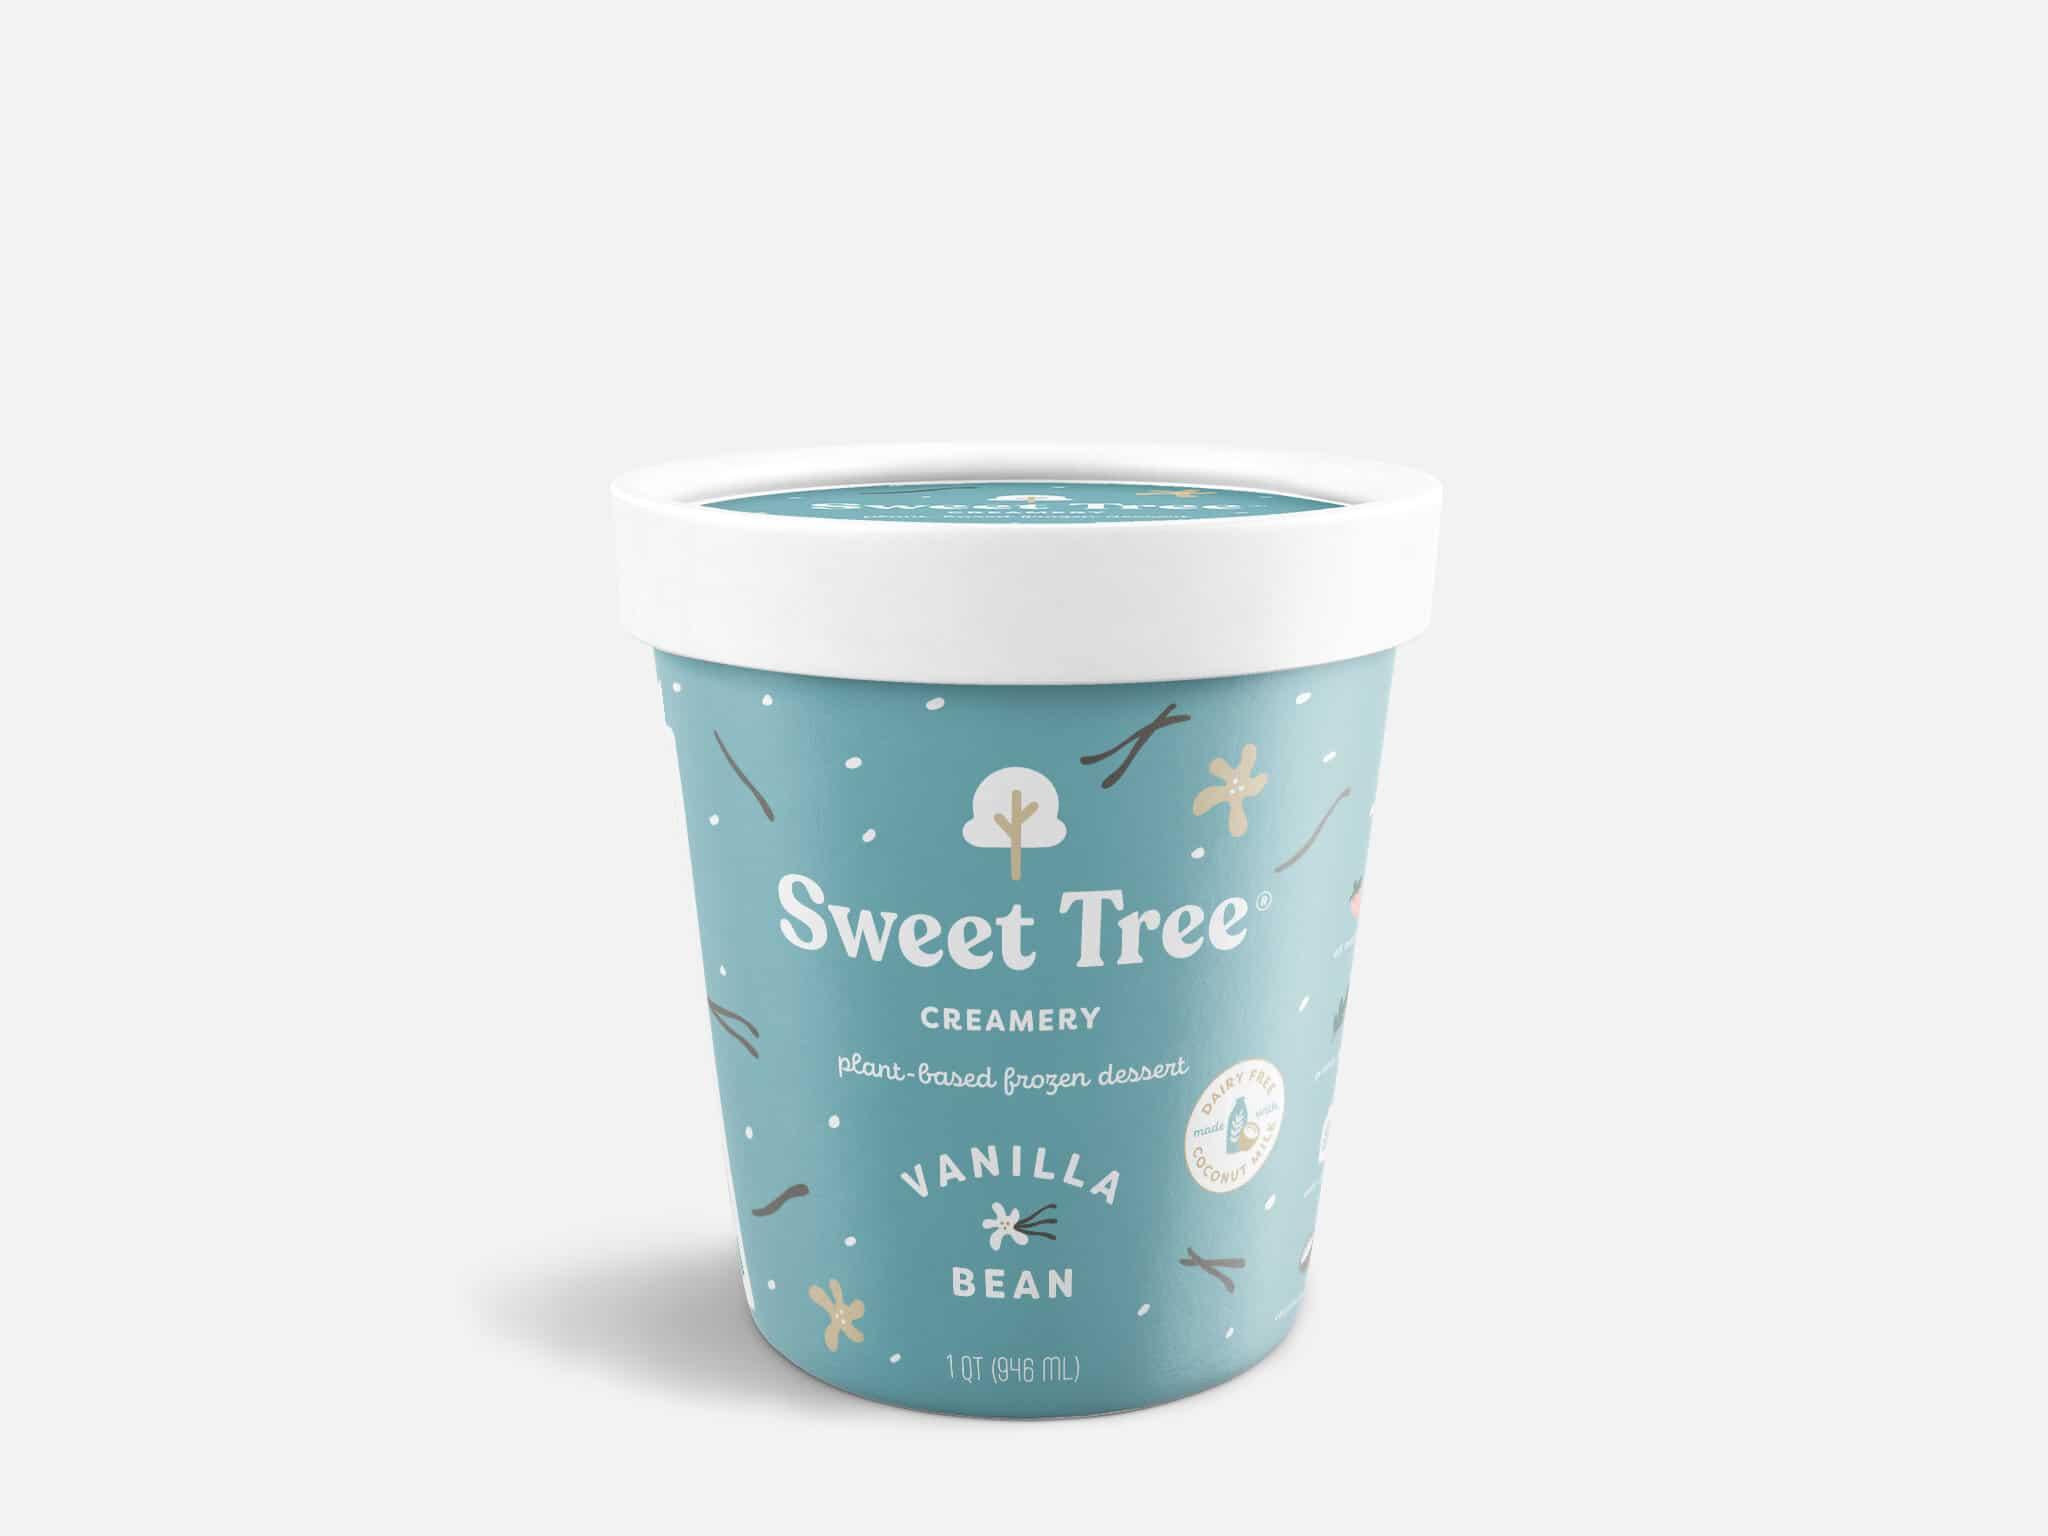 Sweet Tree Creamery Brings Plant-Based Ice Cream To New England